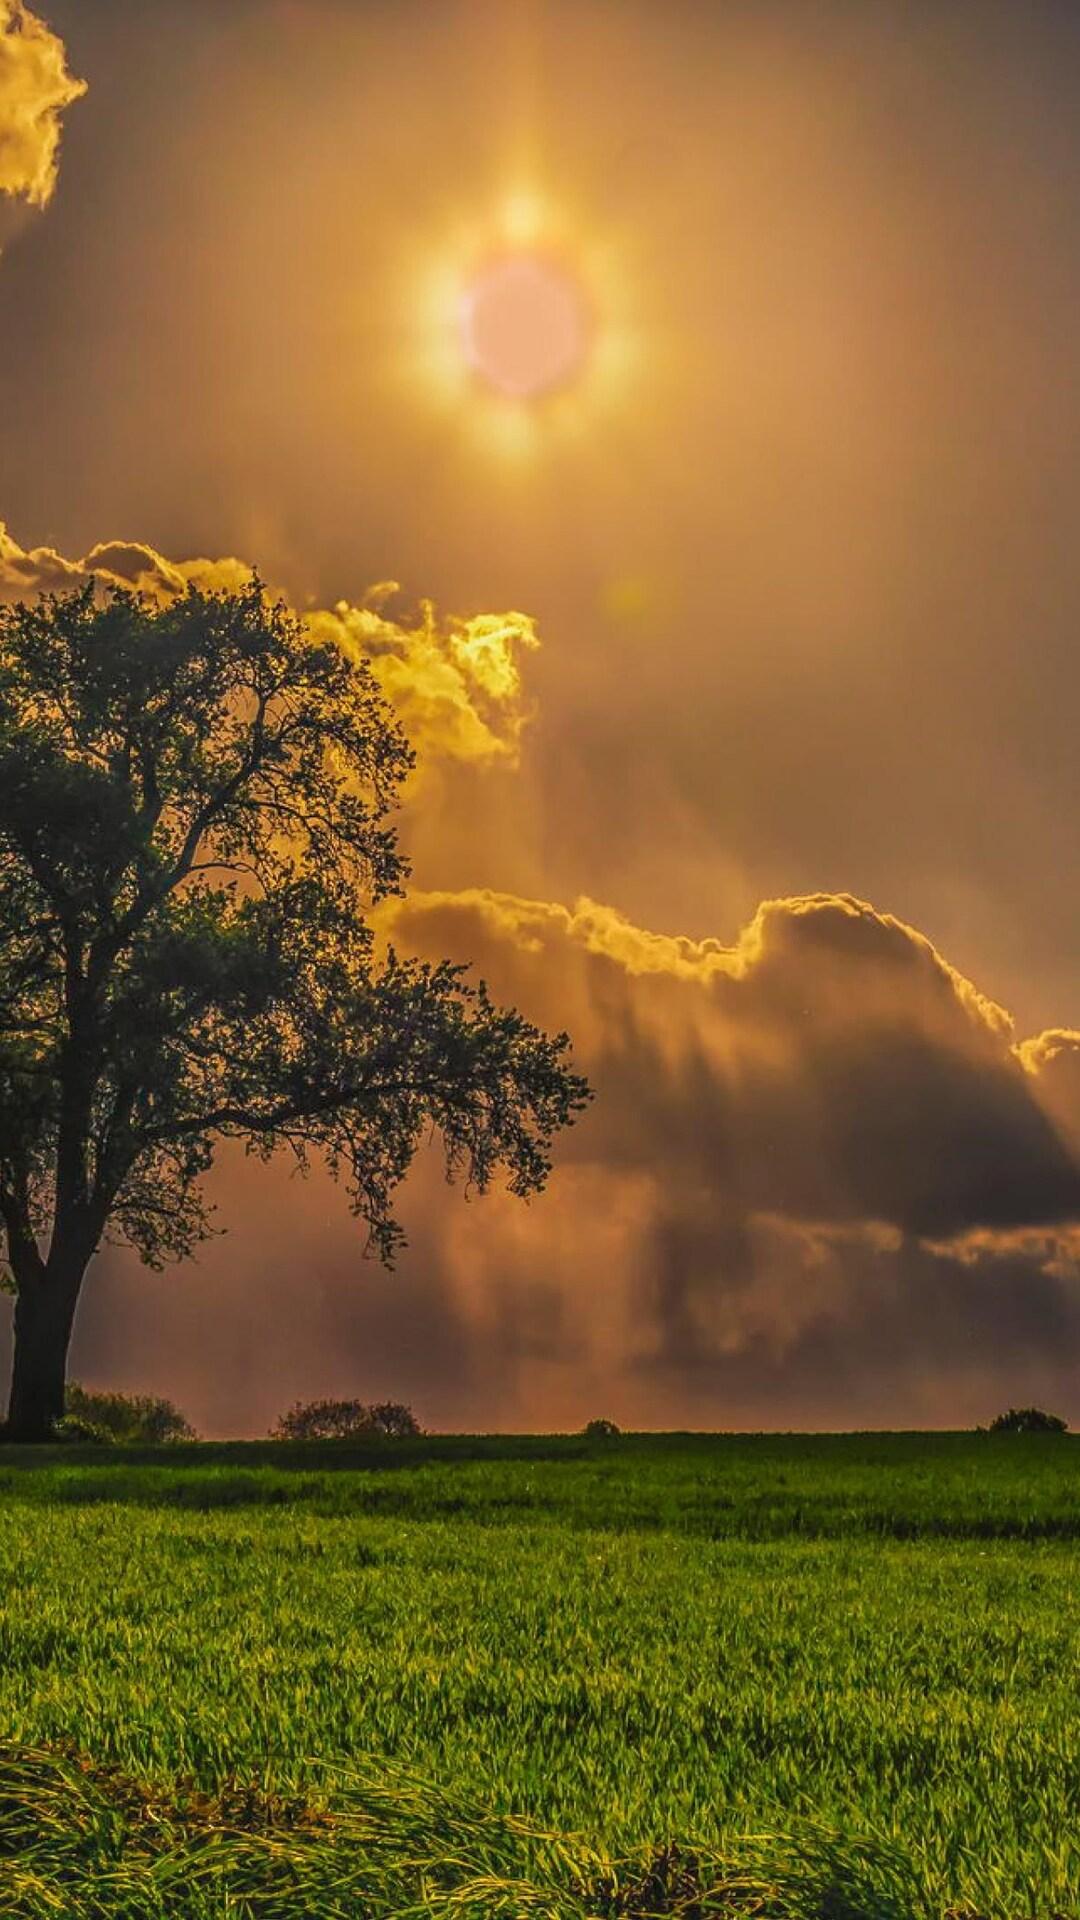 field-trees-grass-sky.jpg